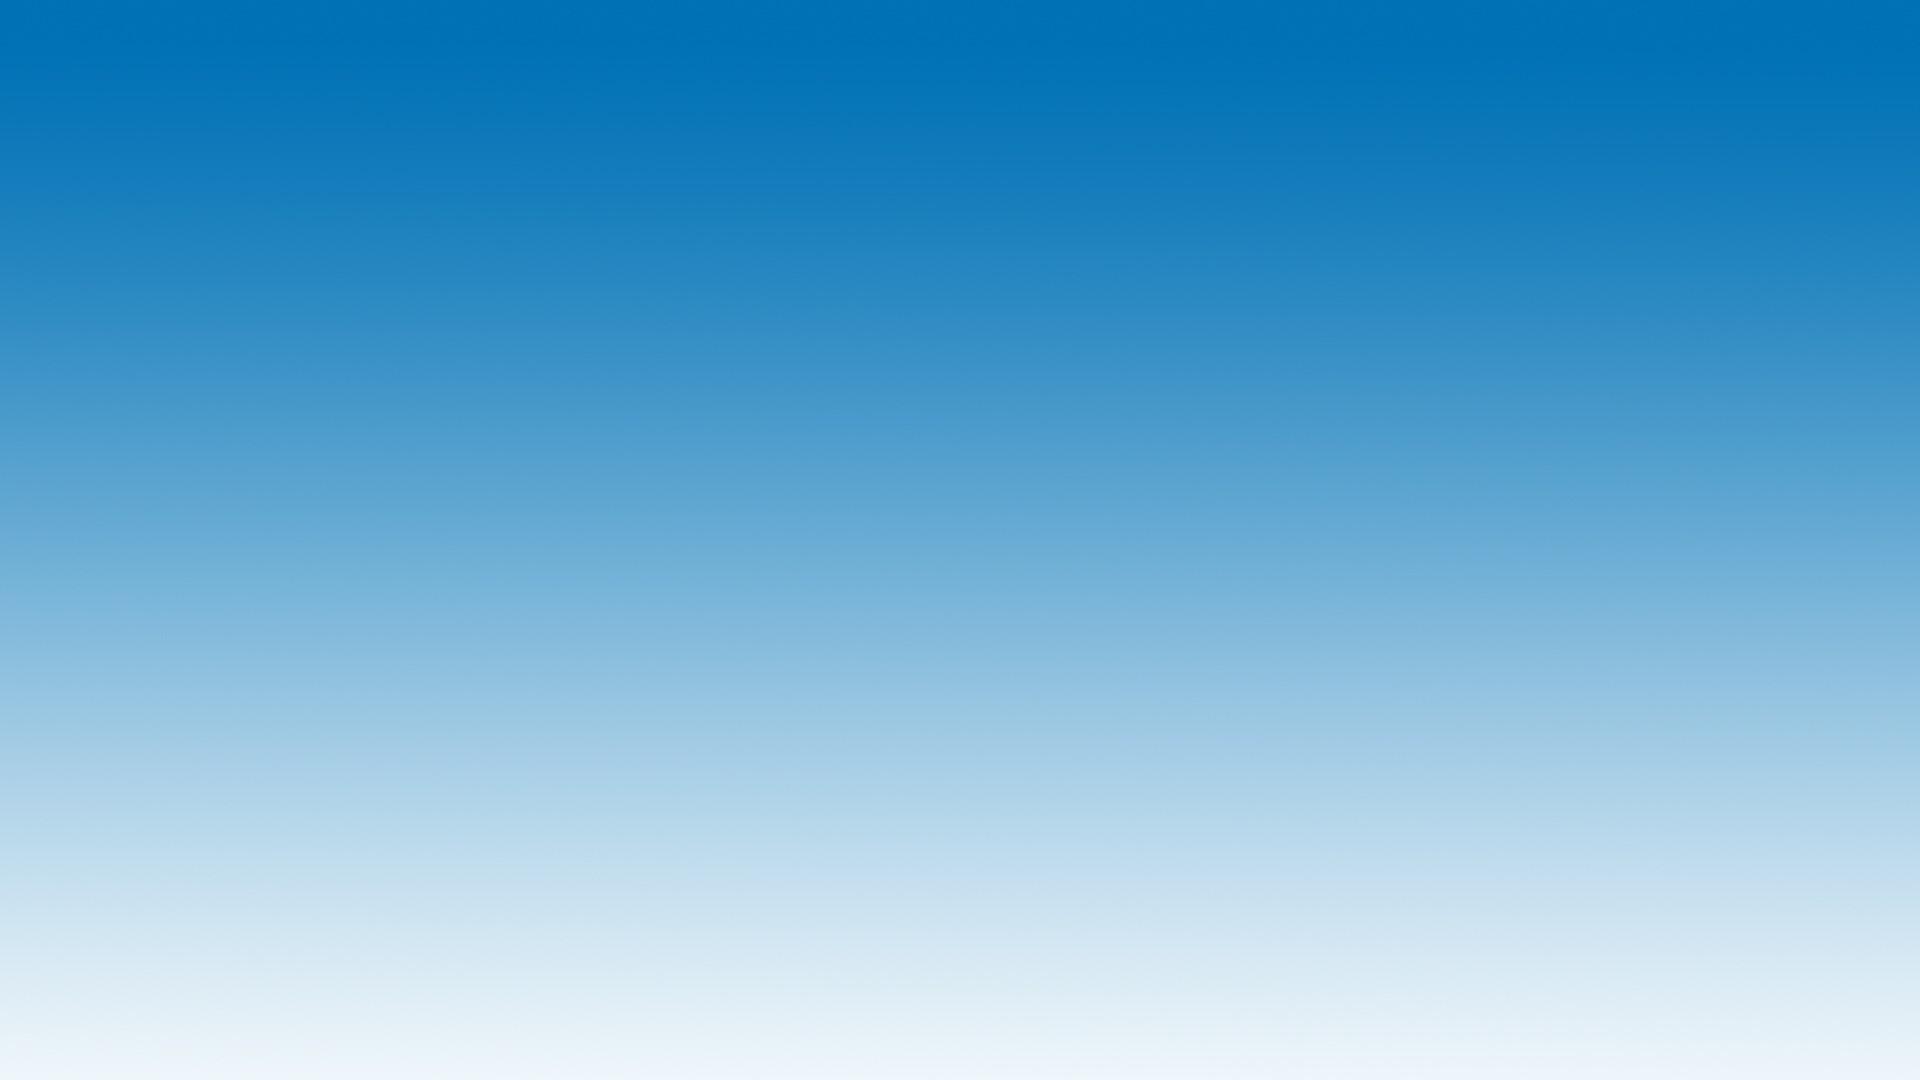 orthopäde osteopathie hömeopathie akupunktur bayreuth